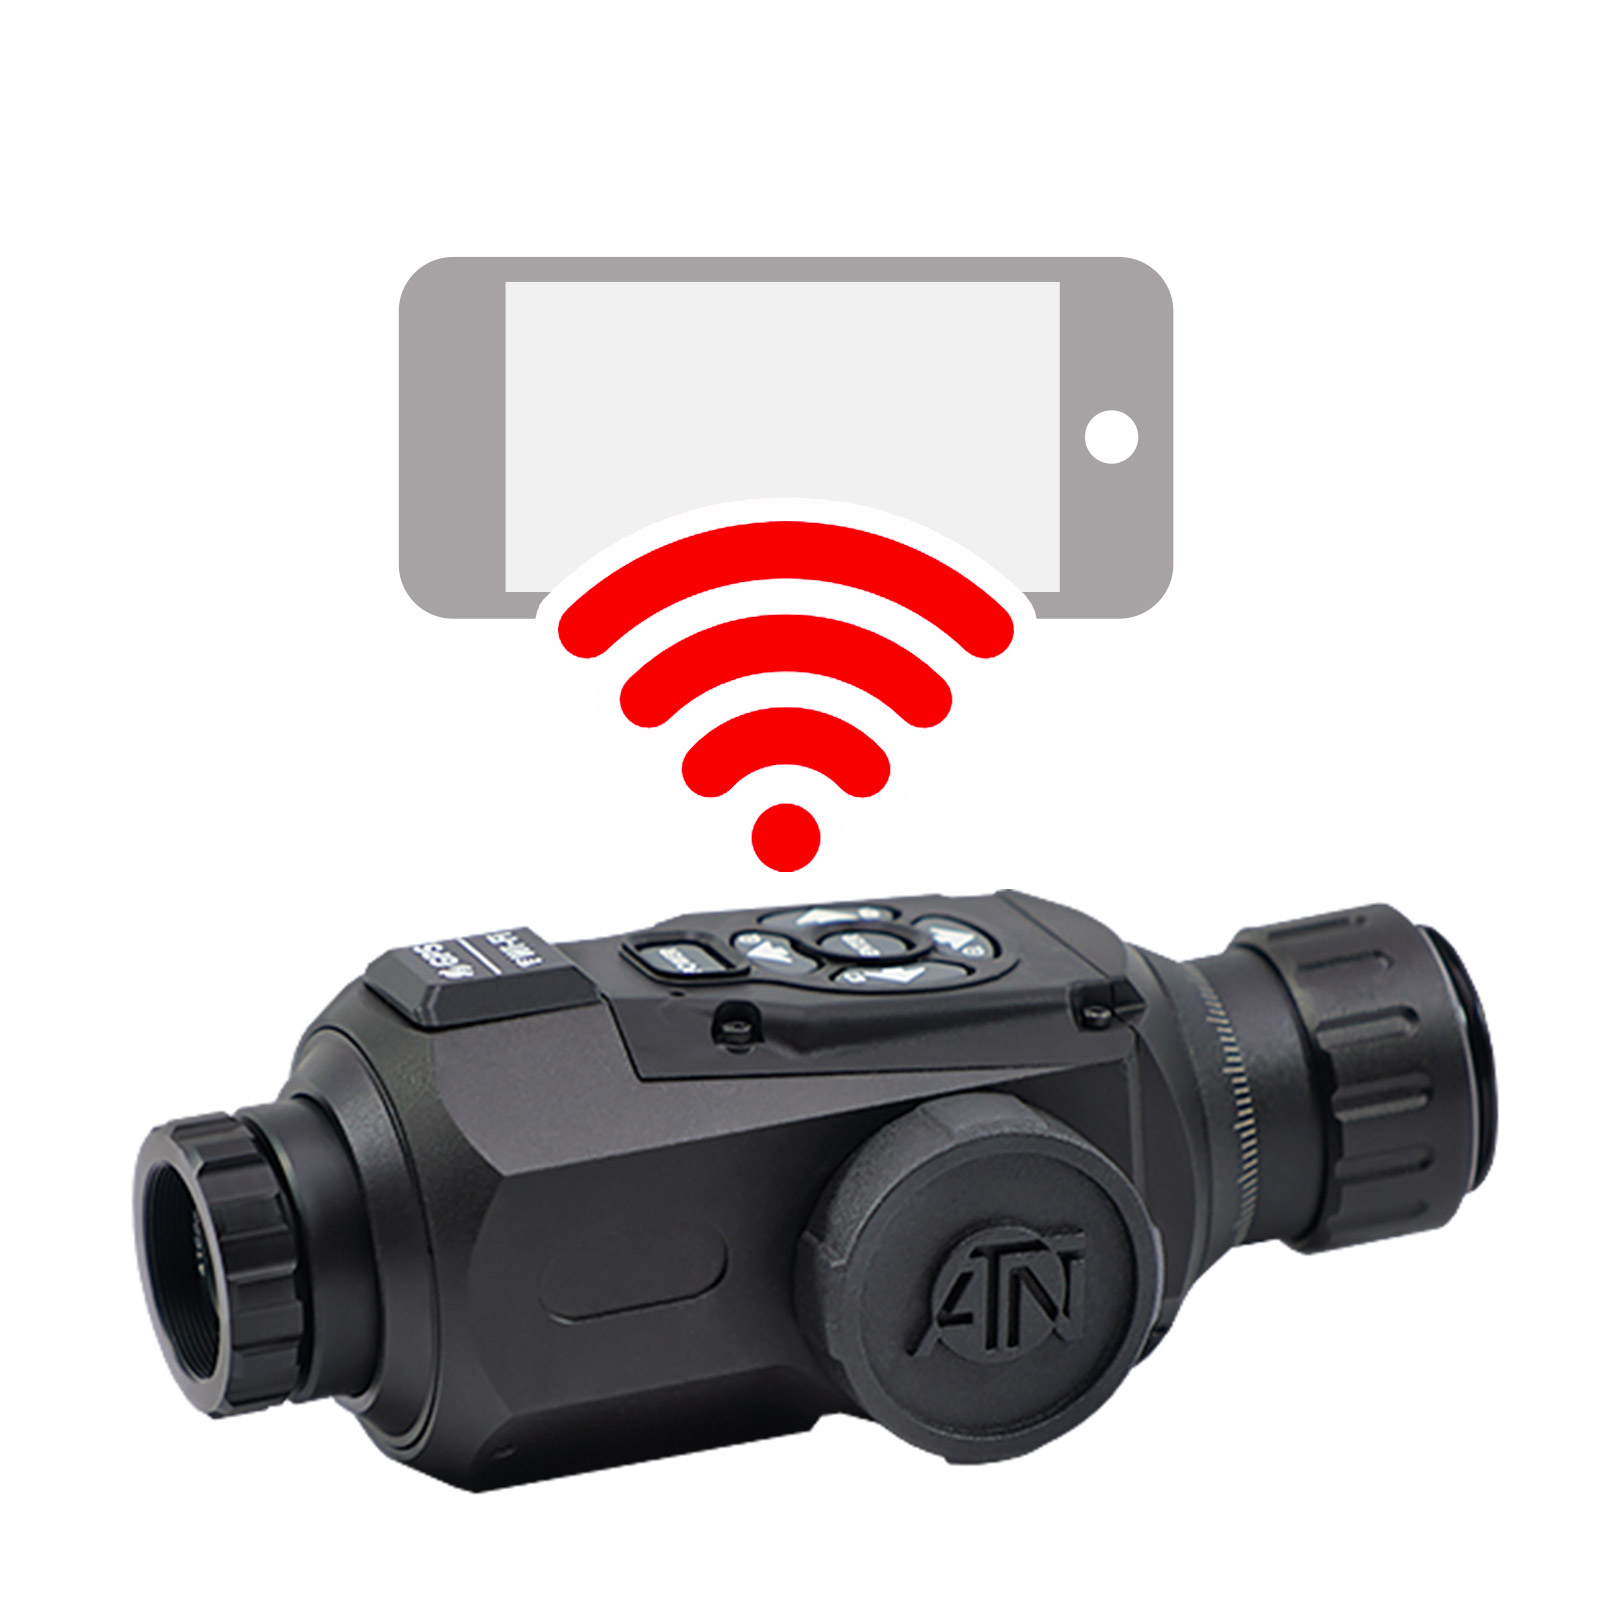 ATN OTS-HD Monocular, 2-8×25